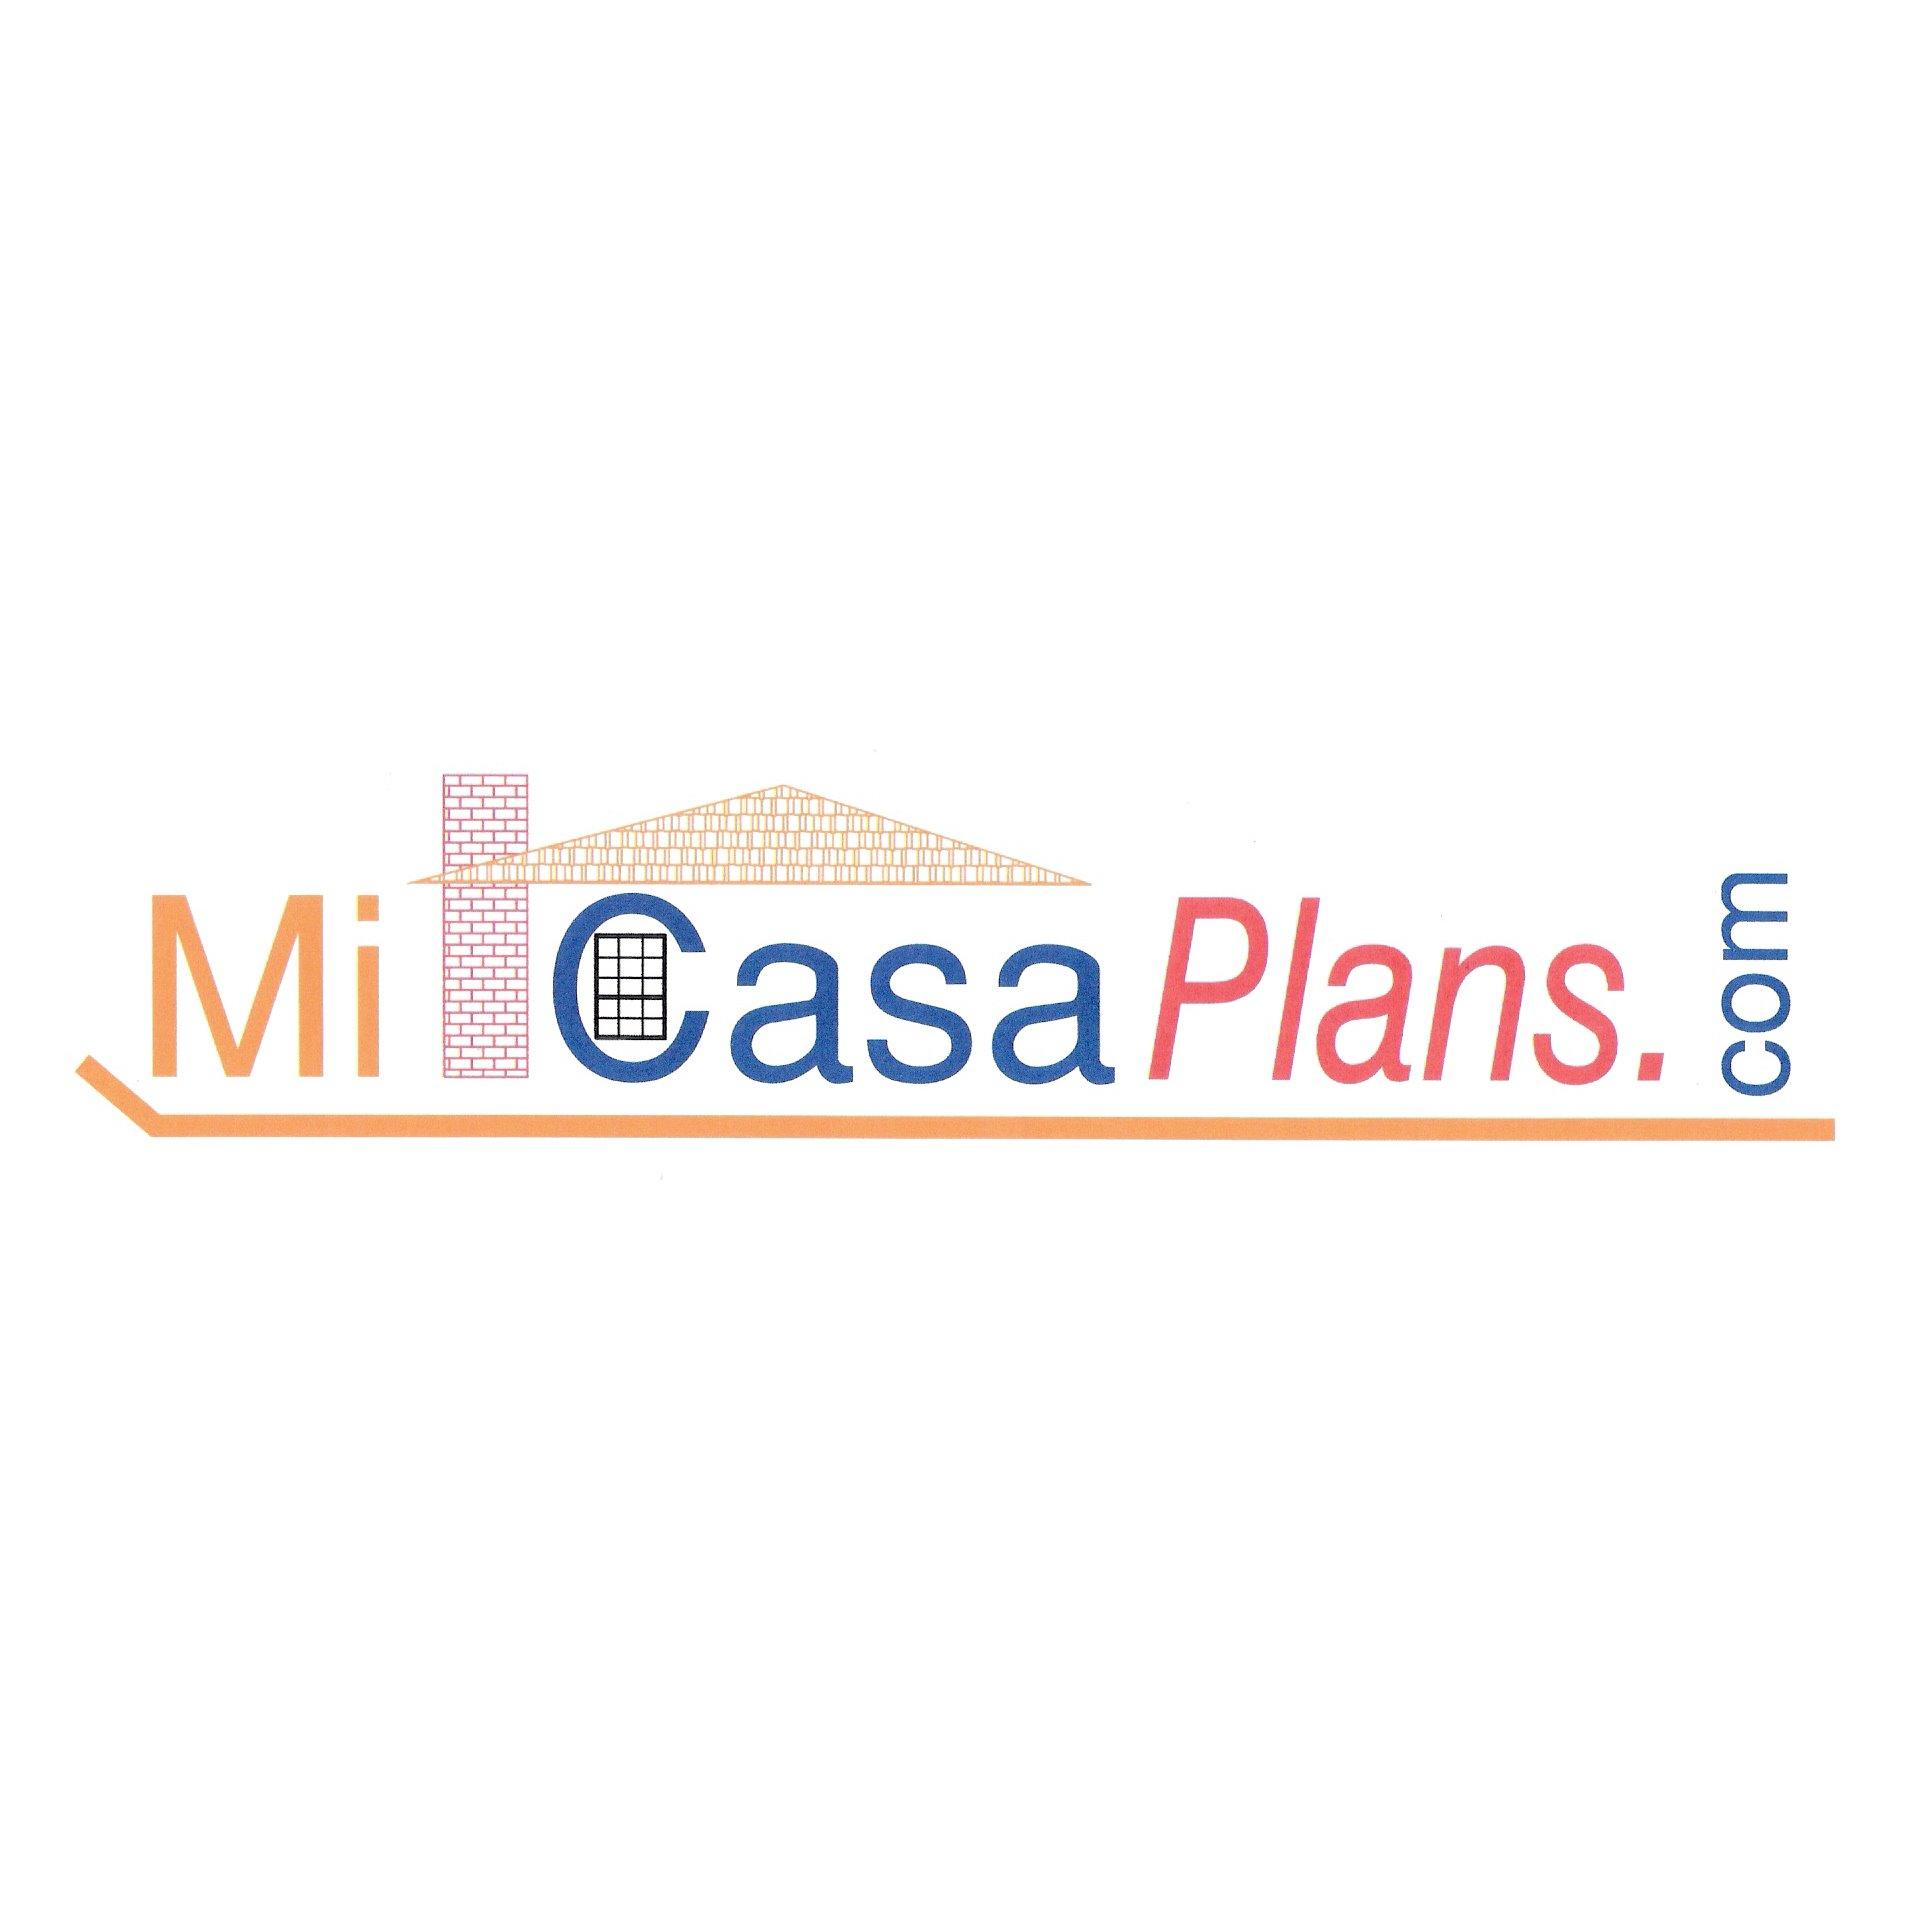 Mi Casa Plans - Houston, TX - Copying & Printing Services